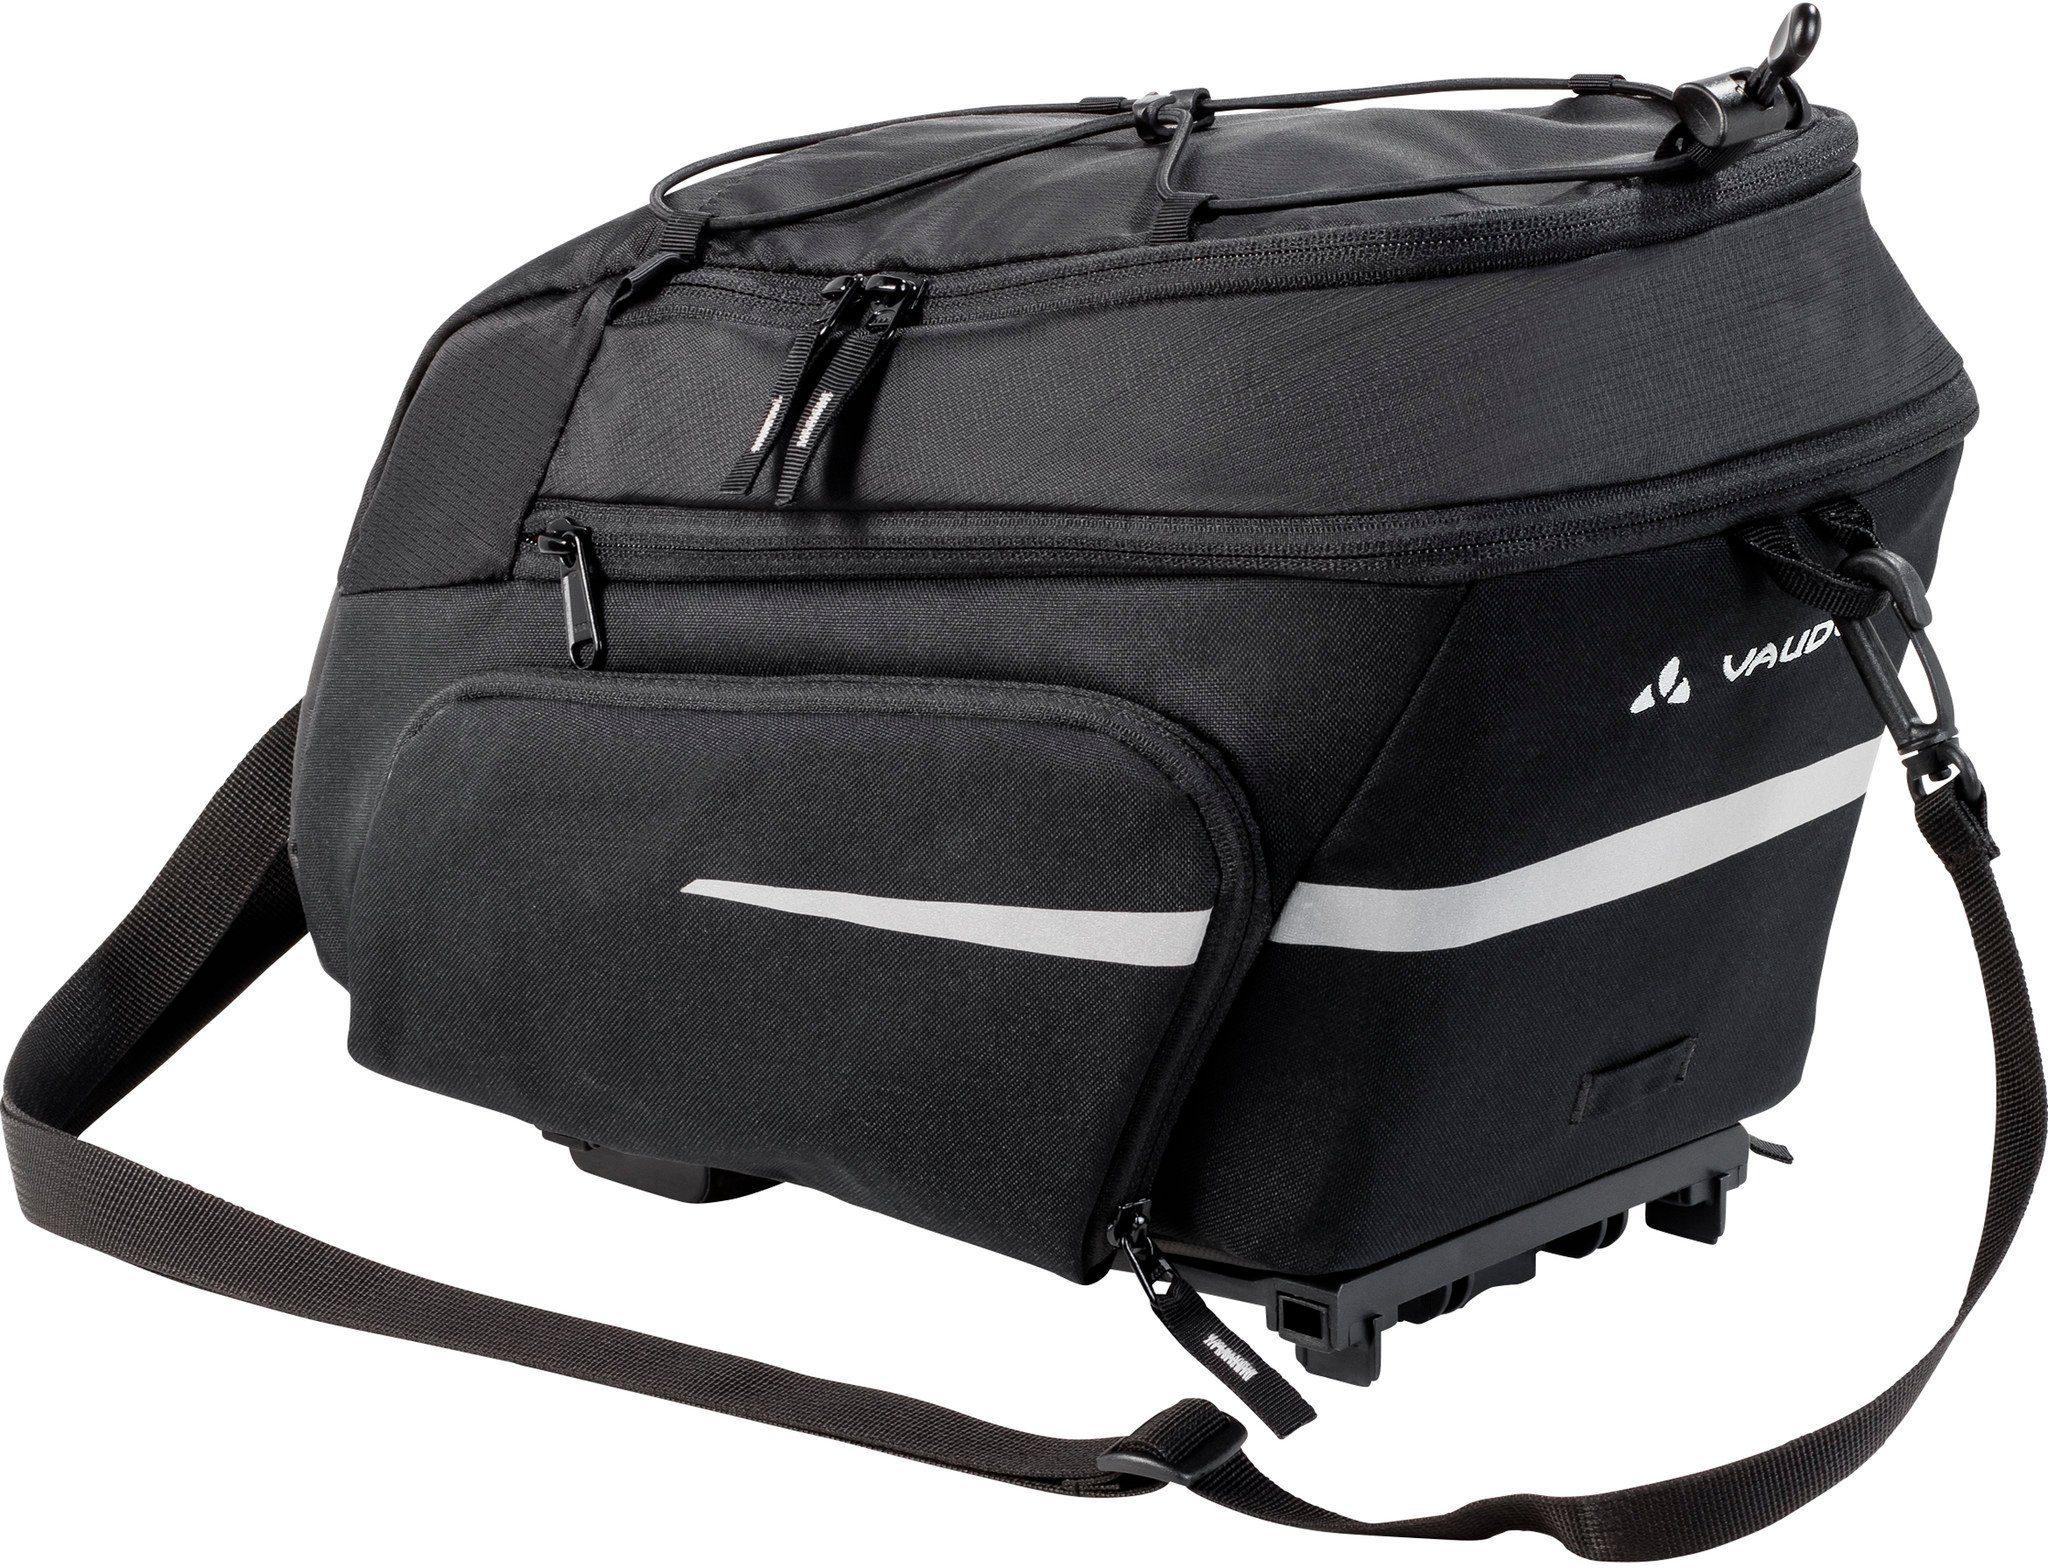 VAUDE Gepäckträgertasche »Silkroad Plus Rack Bag i-Rack«